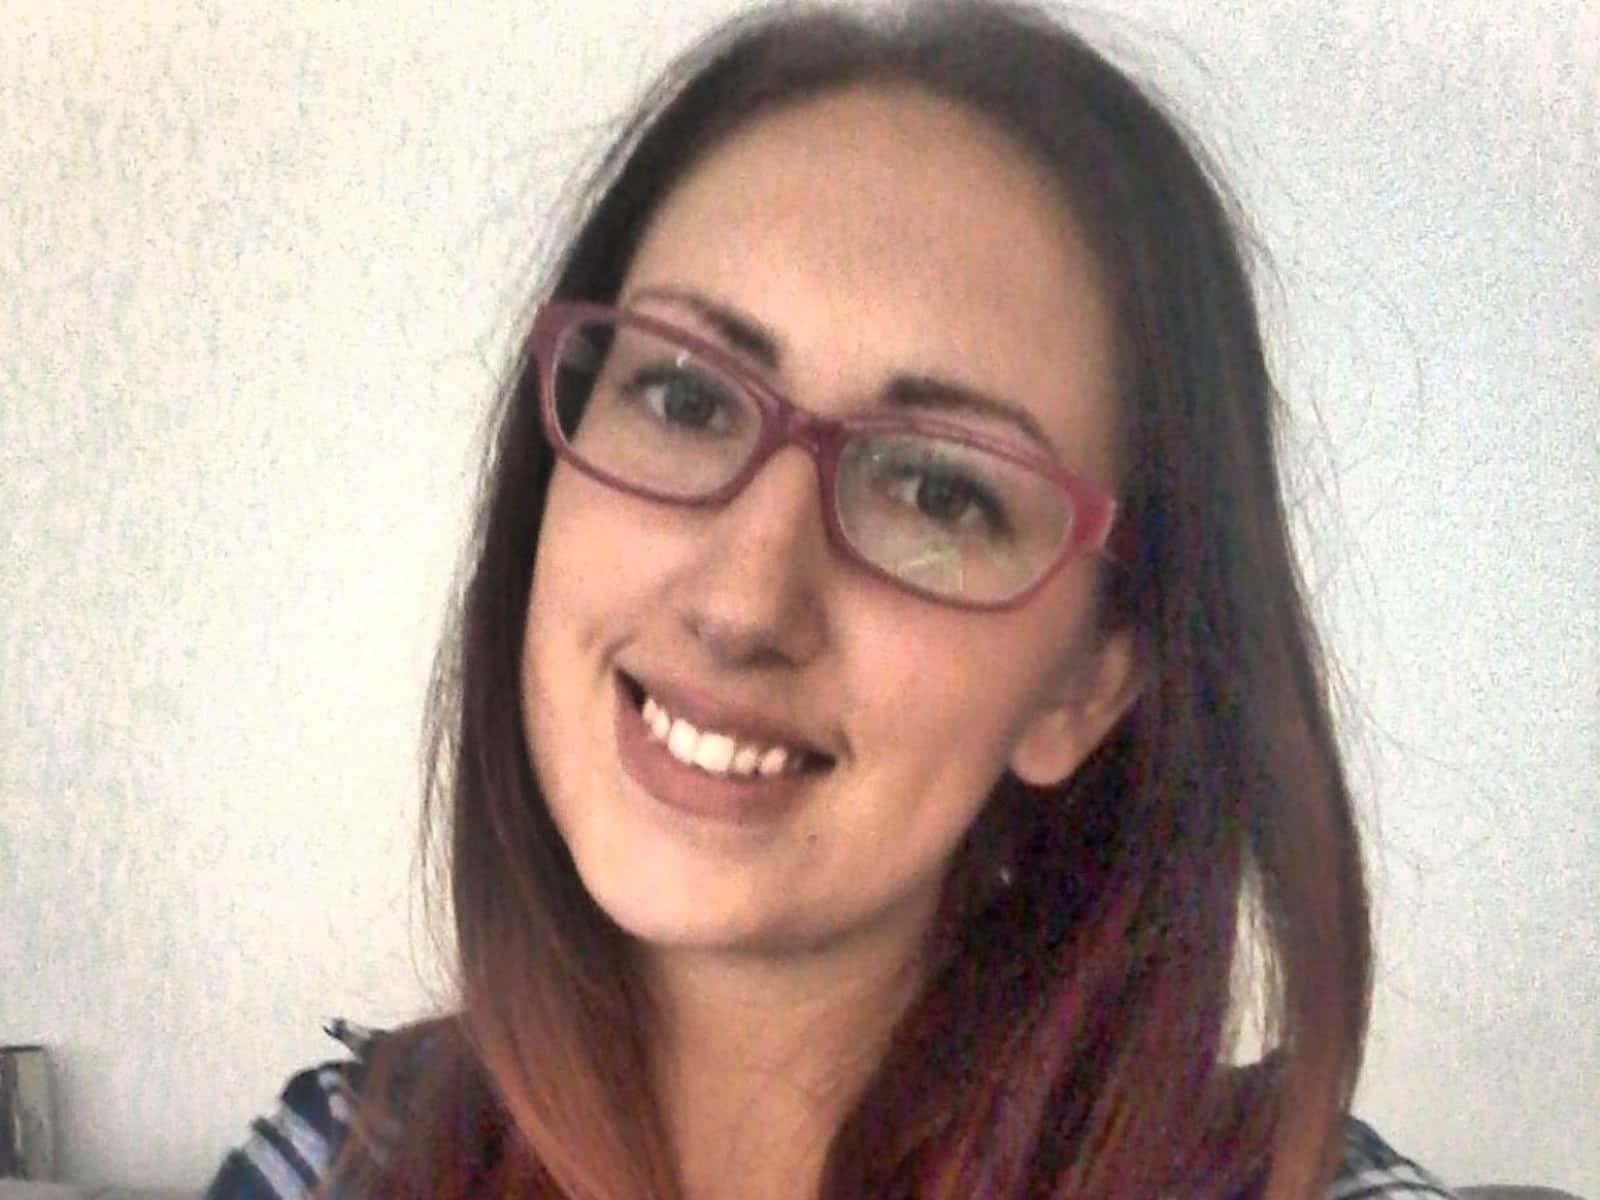 Jelena from Belgrade, Serbia